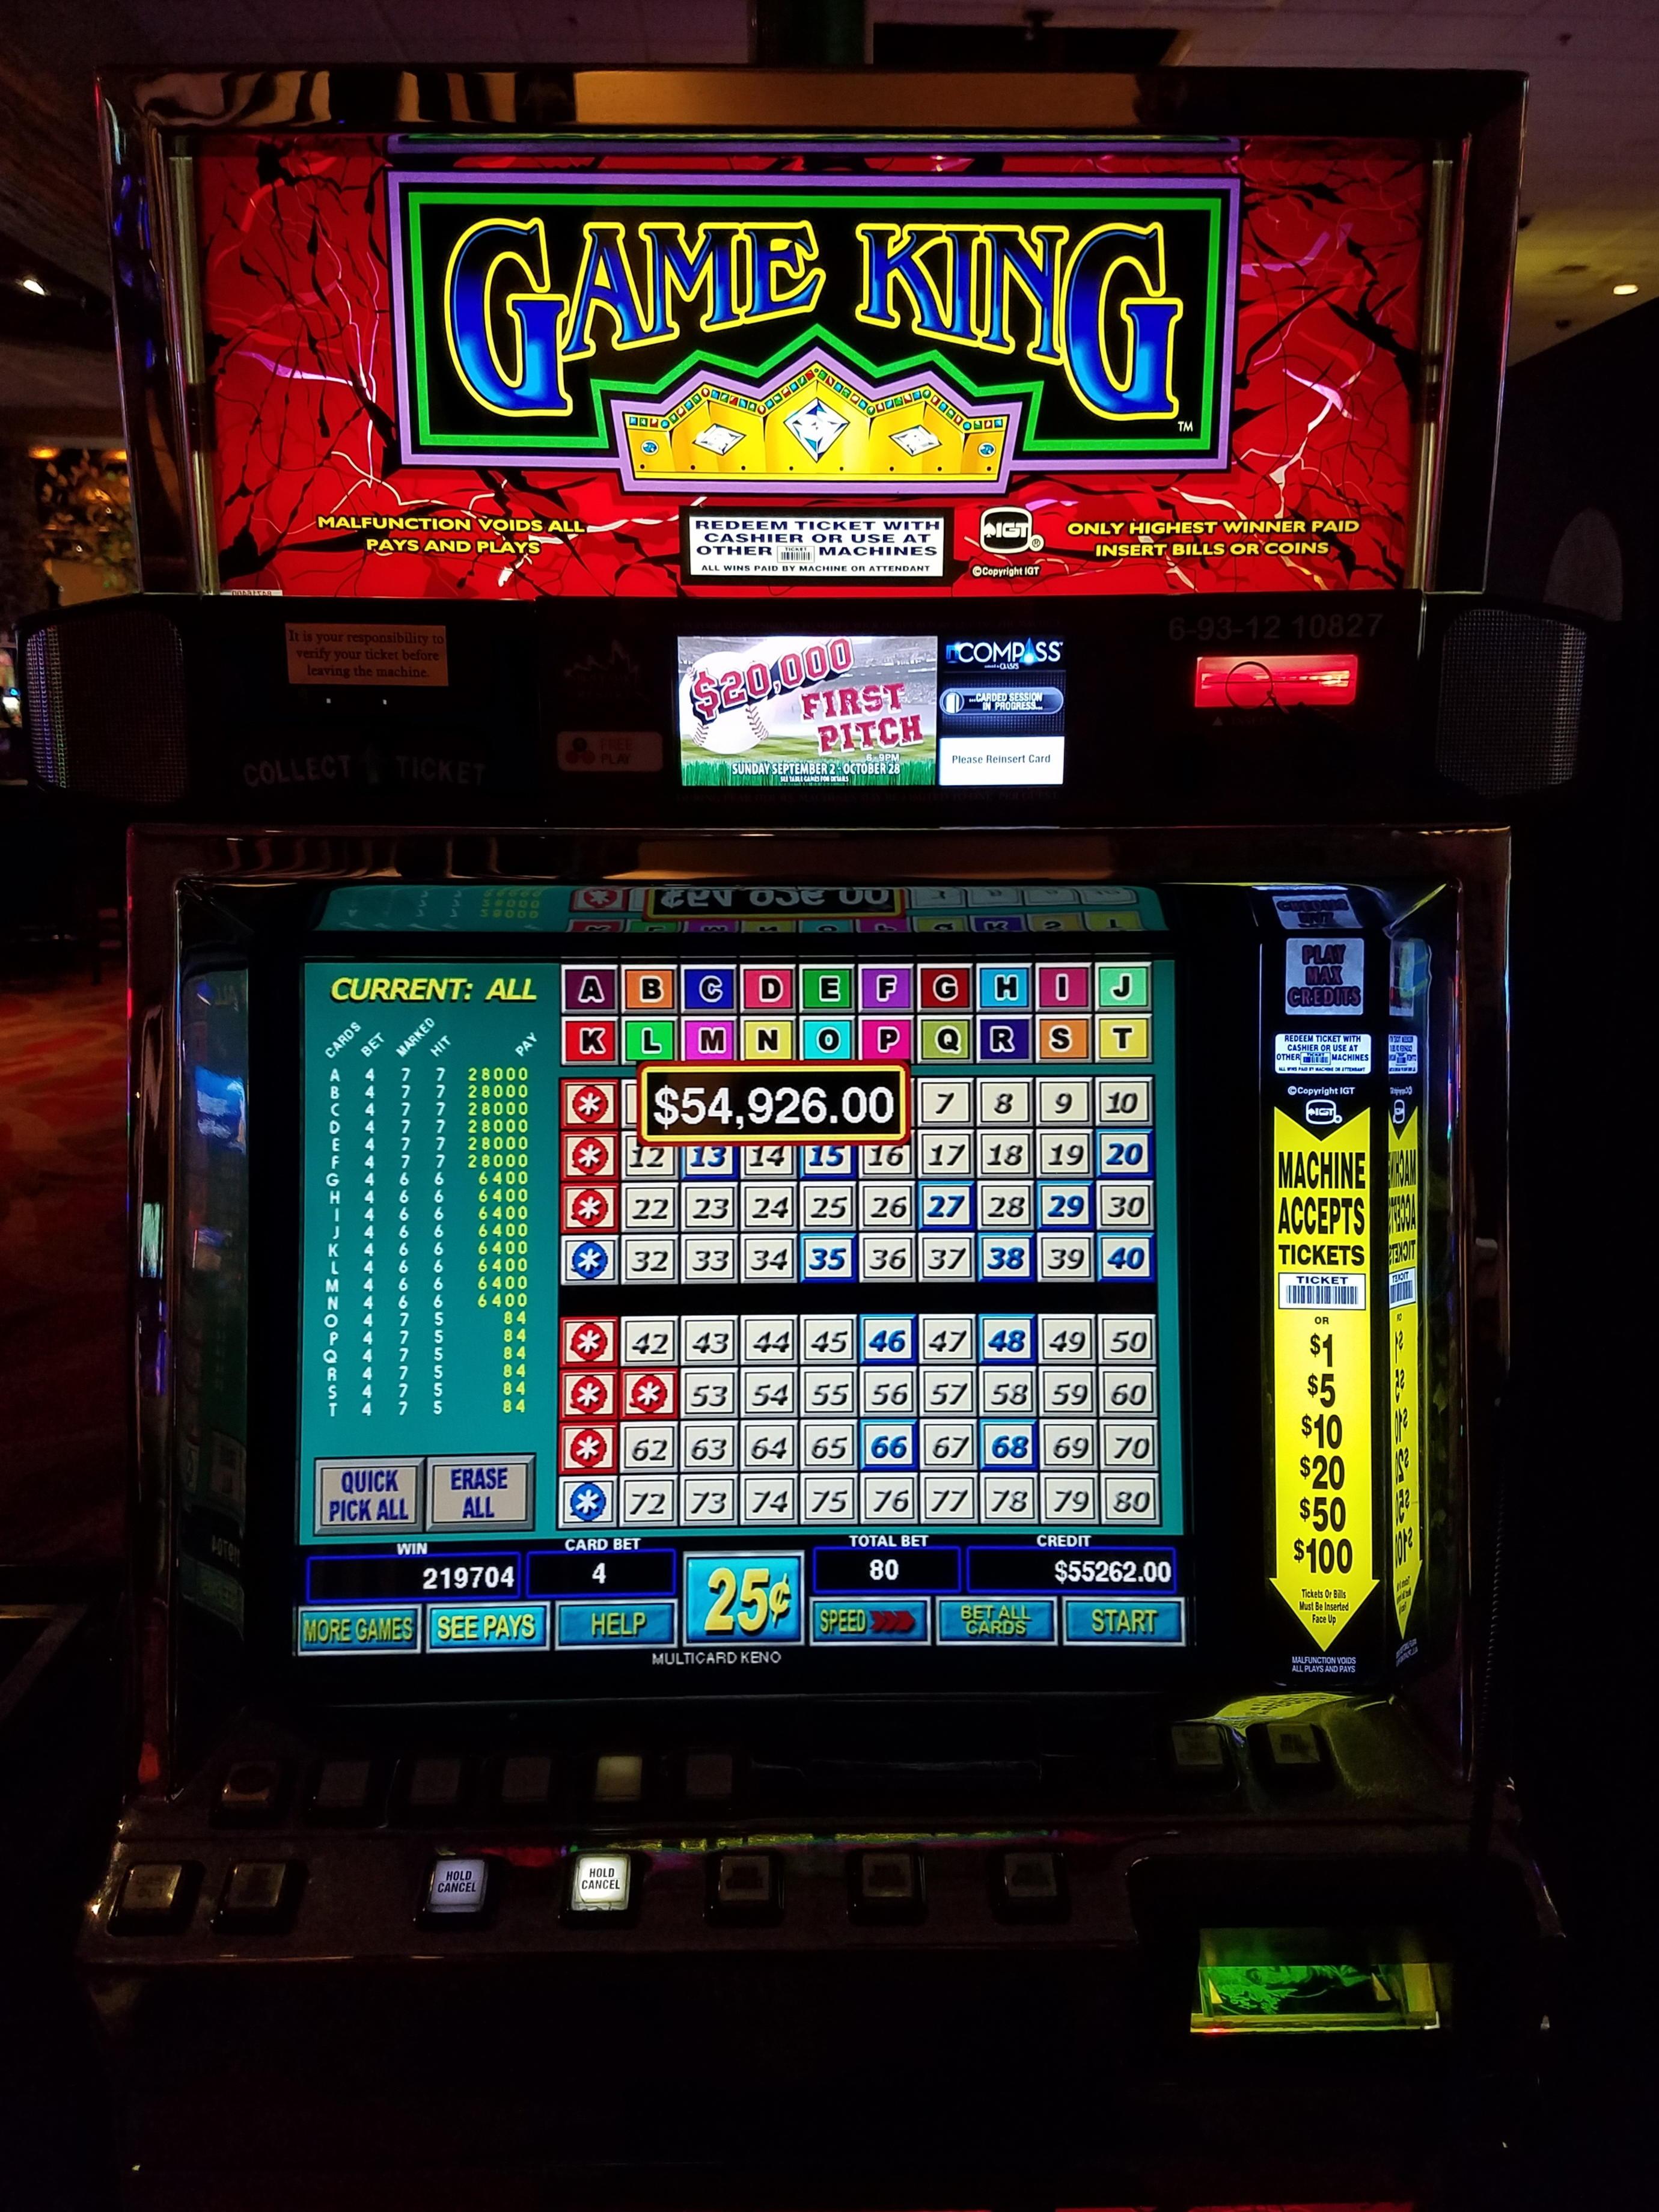 135 free spins casino at Spin Fiesta